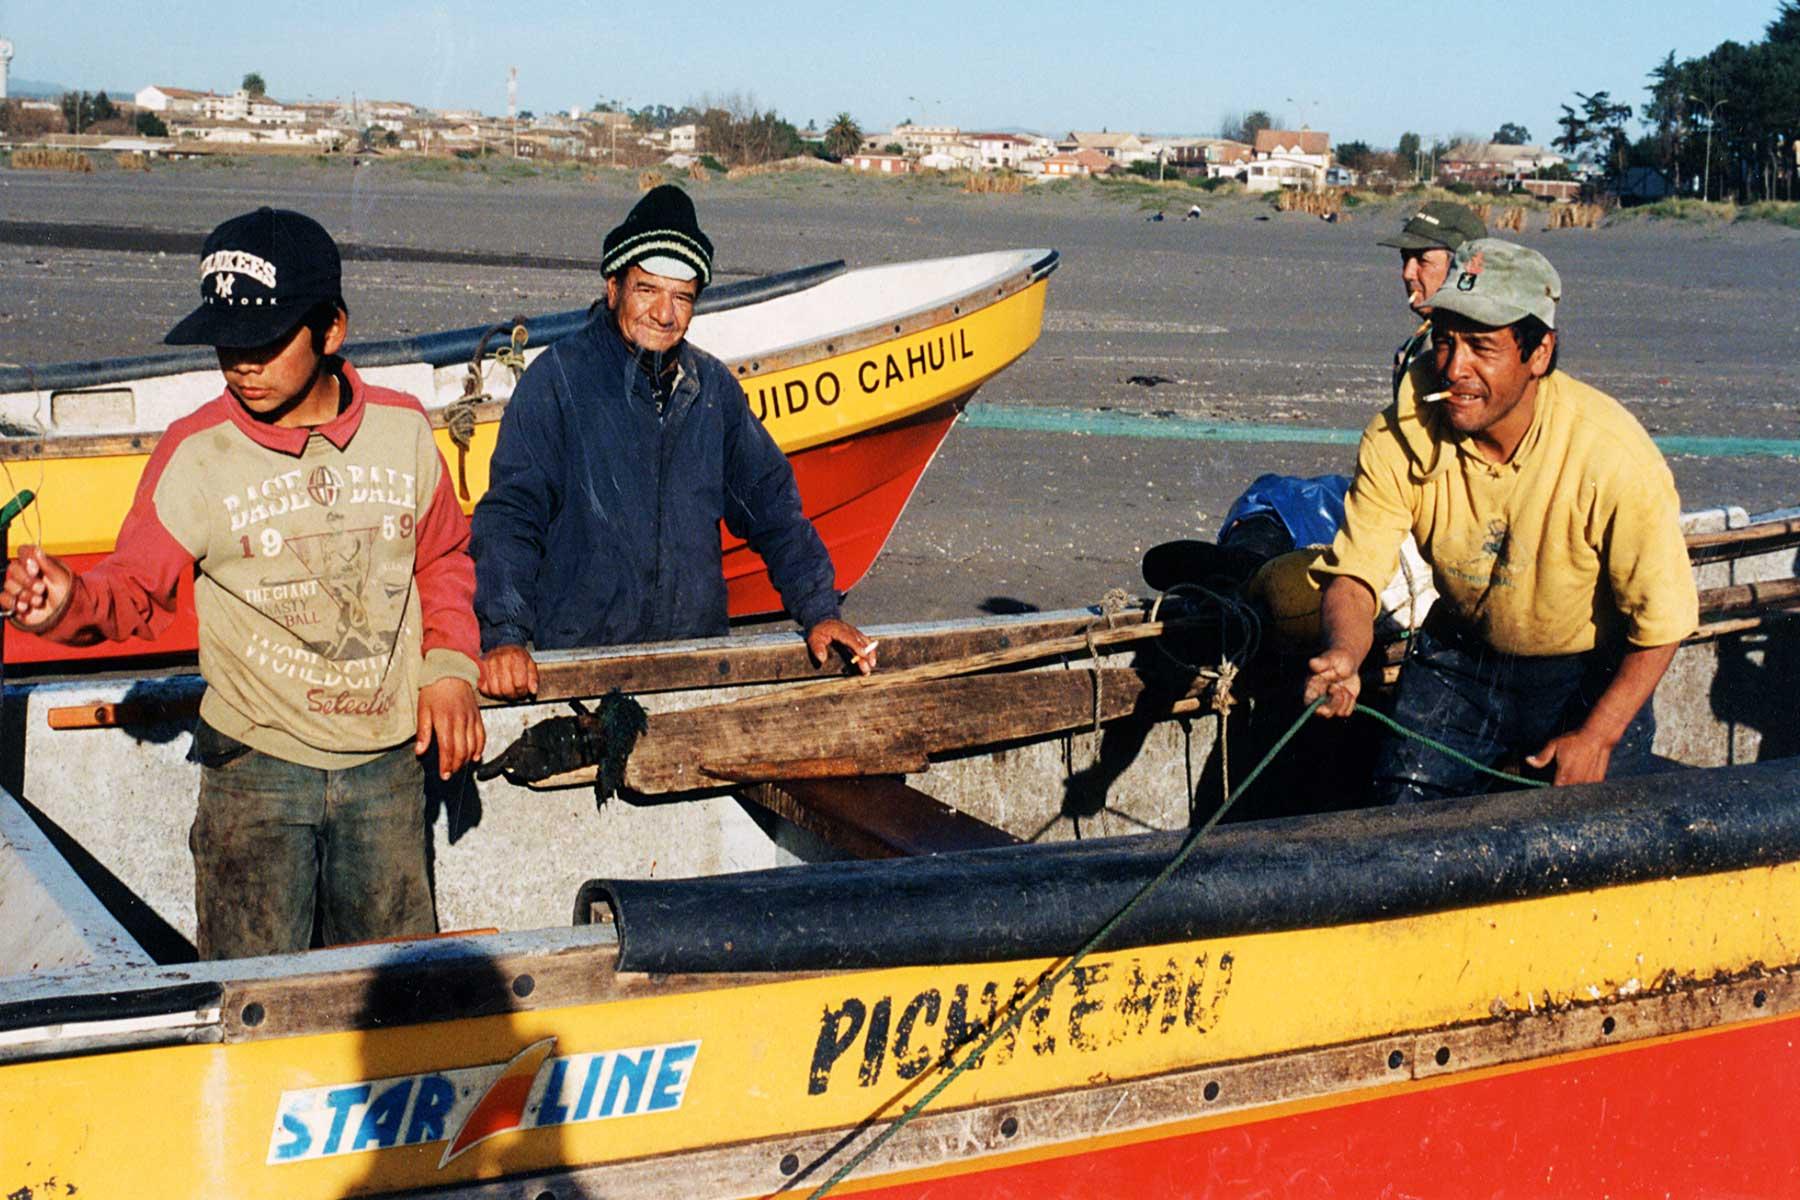 Fishers at Pichilemu | Chile | Steven Andrew Martin | Travel Journal | Dr Steven Martin